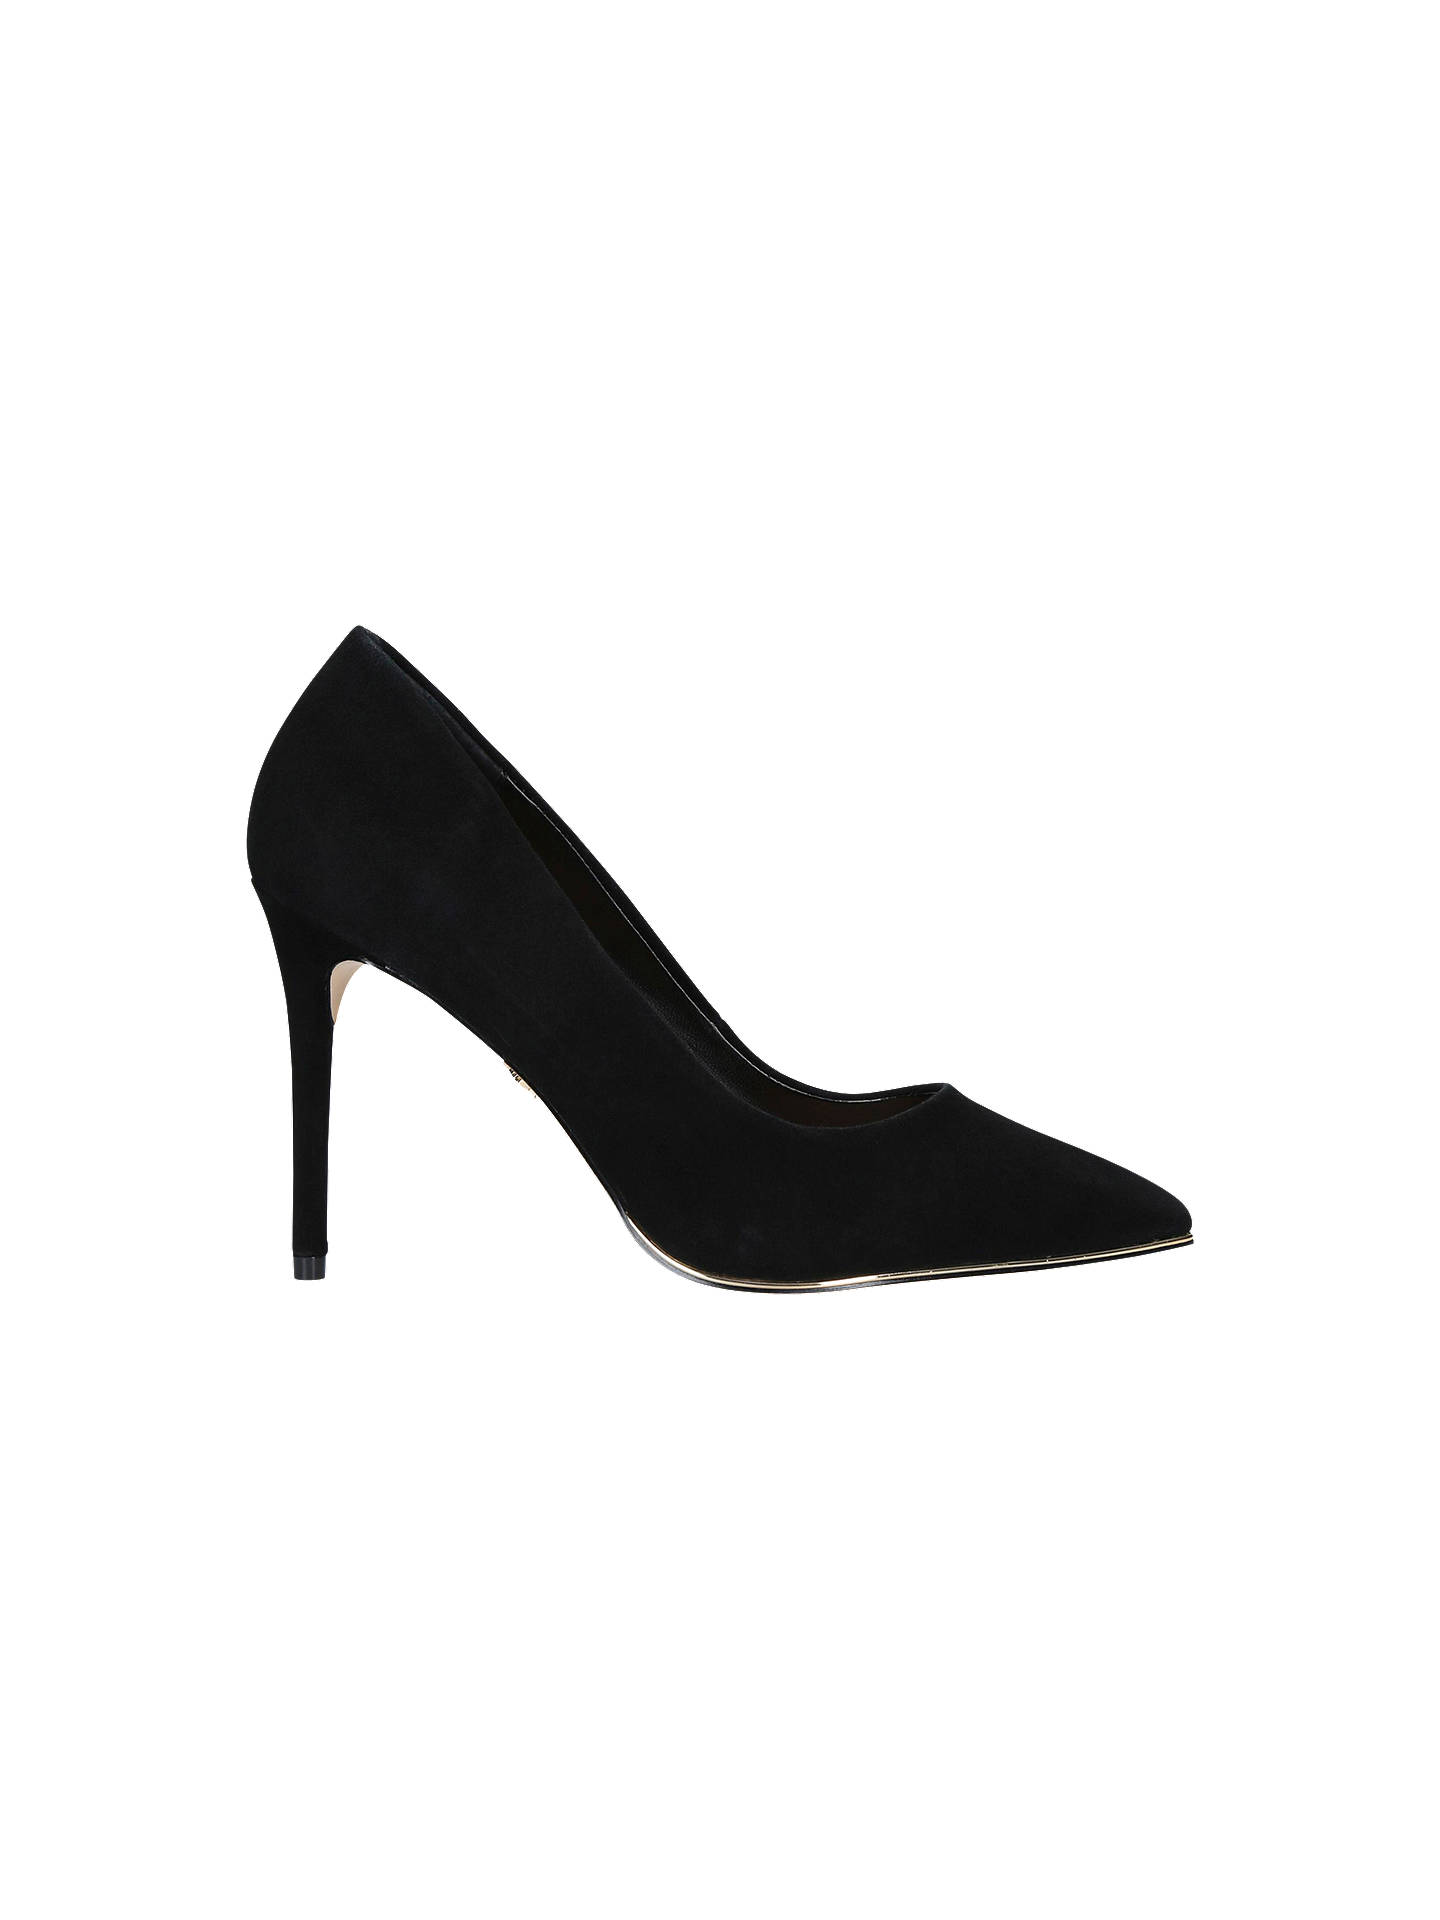 dc5b71d674 Buy Kurt Geiger London Audley High Heel Court Shoes, Black Suede, 3 Online  at ...